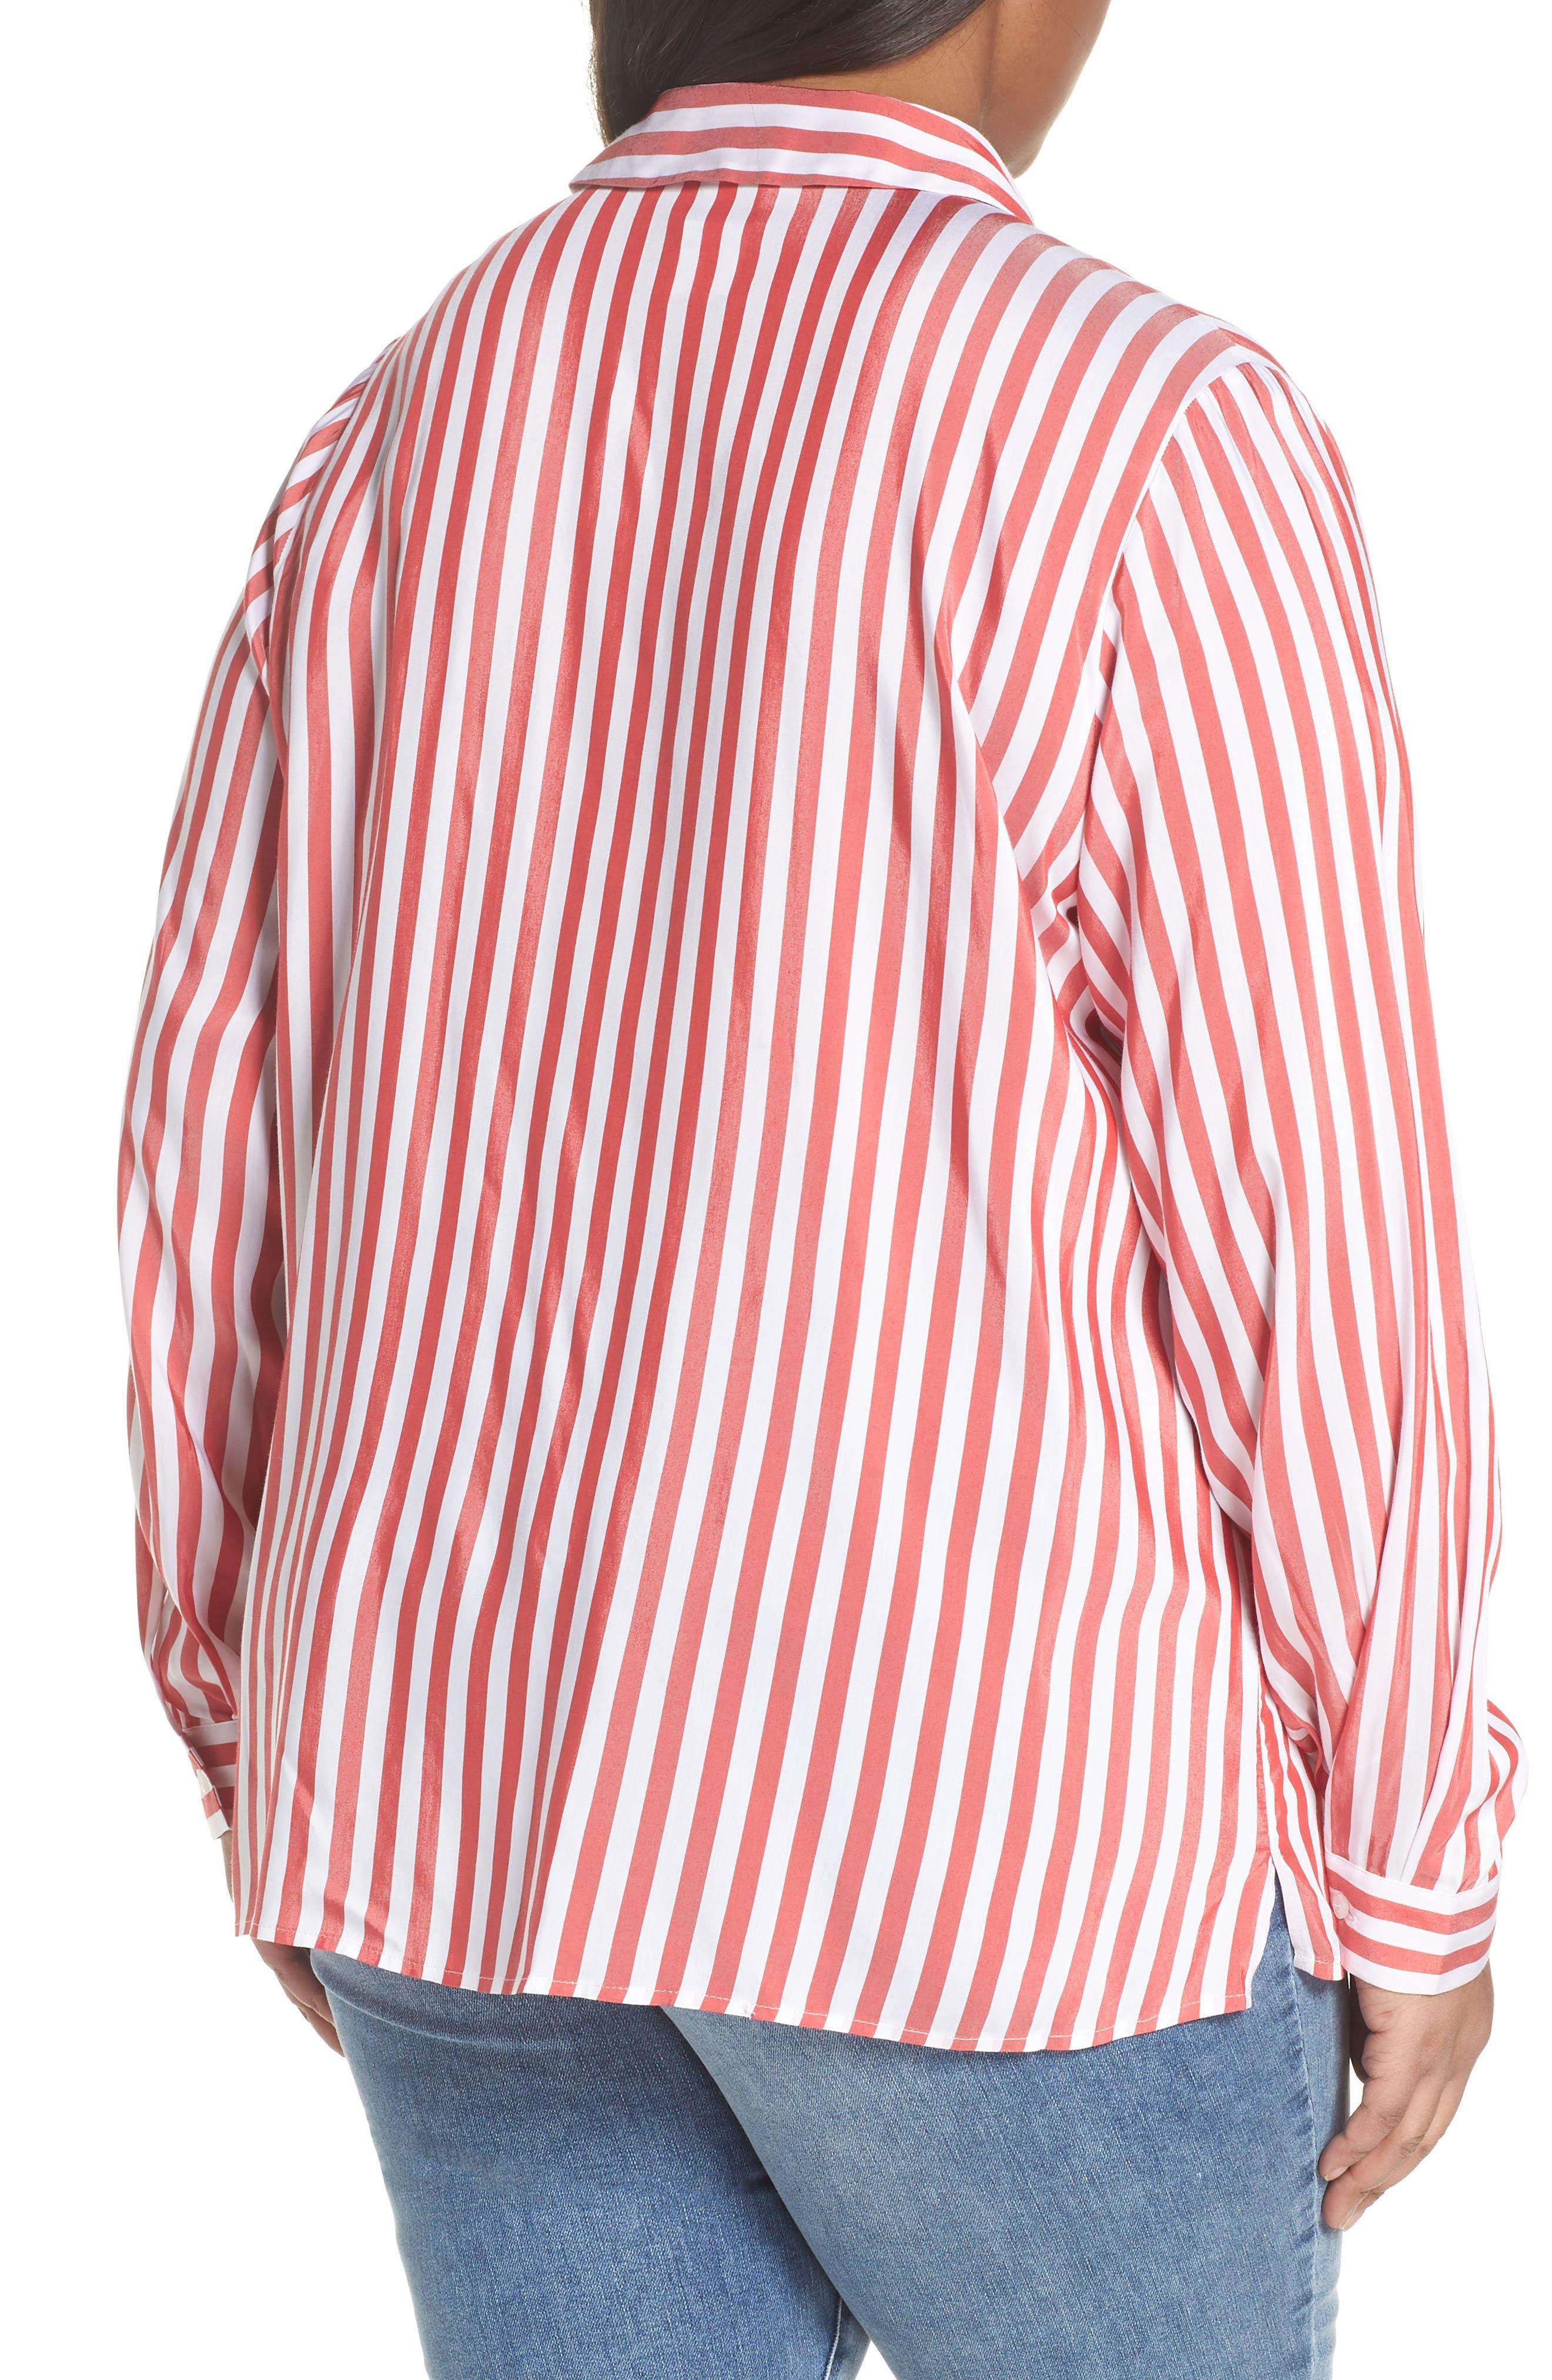 Stripe Blouse,                             Alternate thumbnail 2, color,                             101